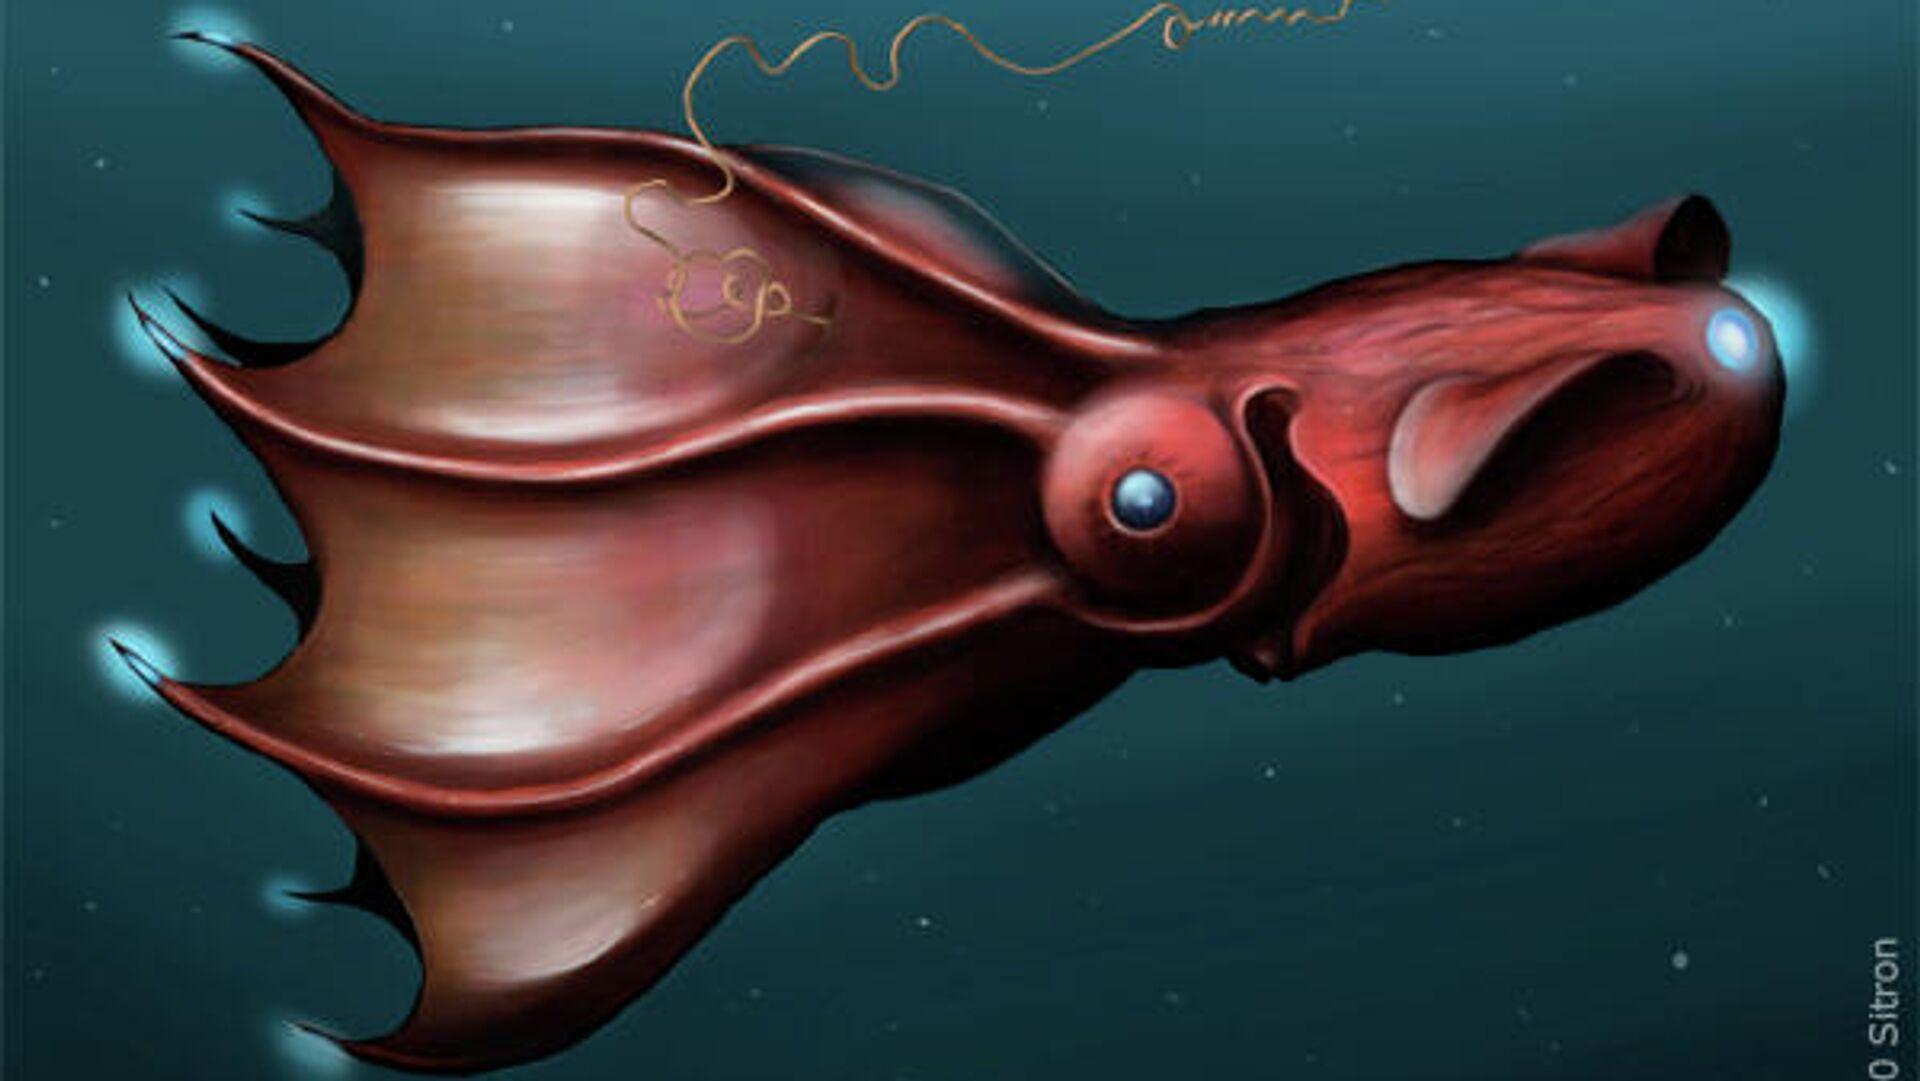 Адский кальмар-вампир Vampyroteuthis infernalis - РИА Новости, 1920, 18.02.2021